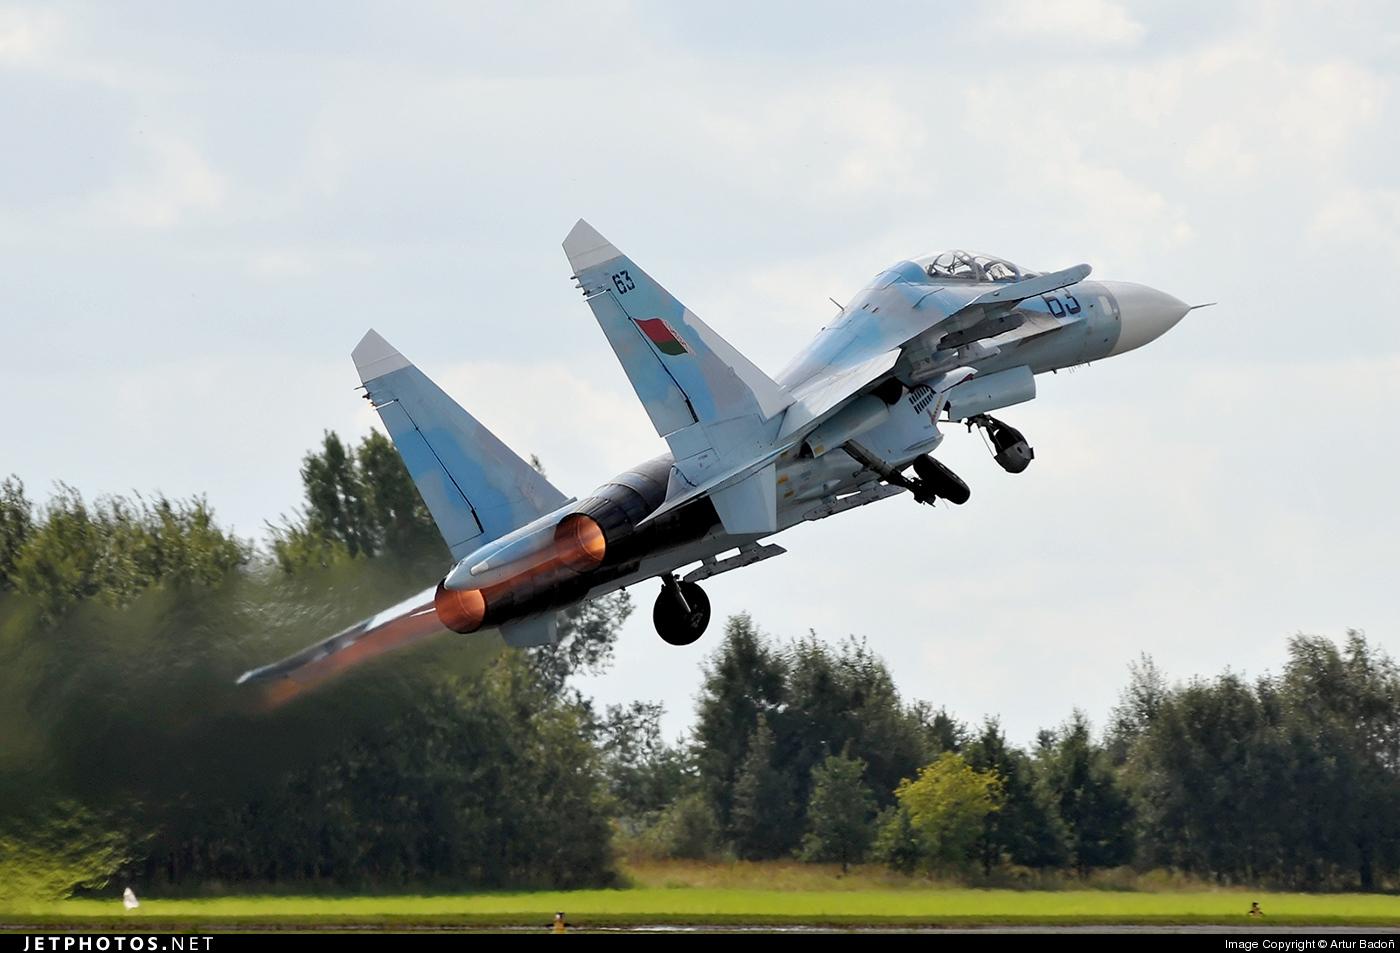 63 - Sukhoi Su-27 Flanker - Belarus - Air Force